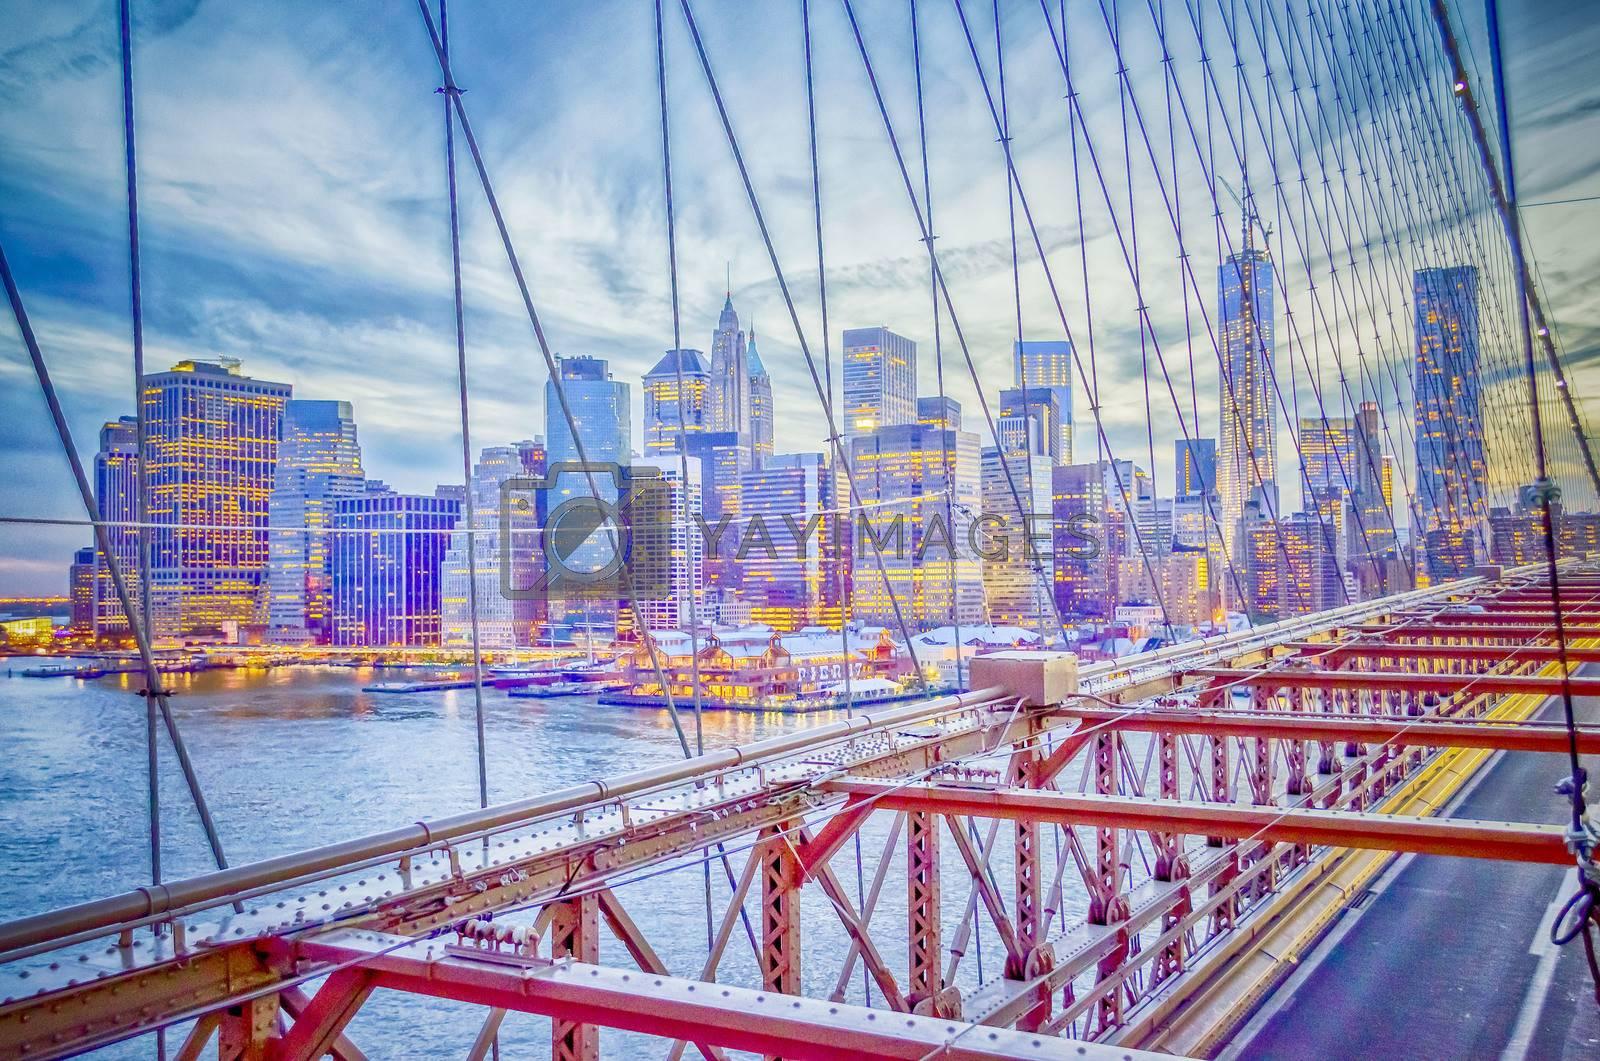 Manhattan View through the wires of Brooklyn Bridge